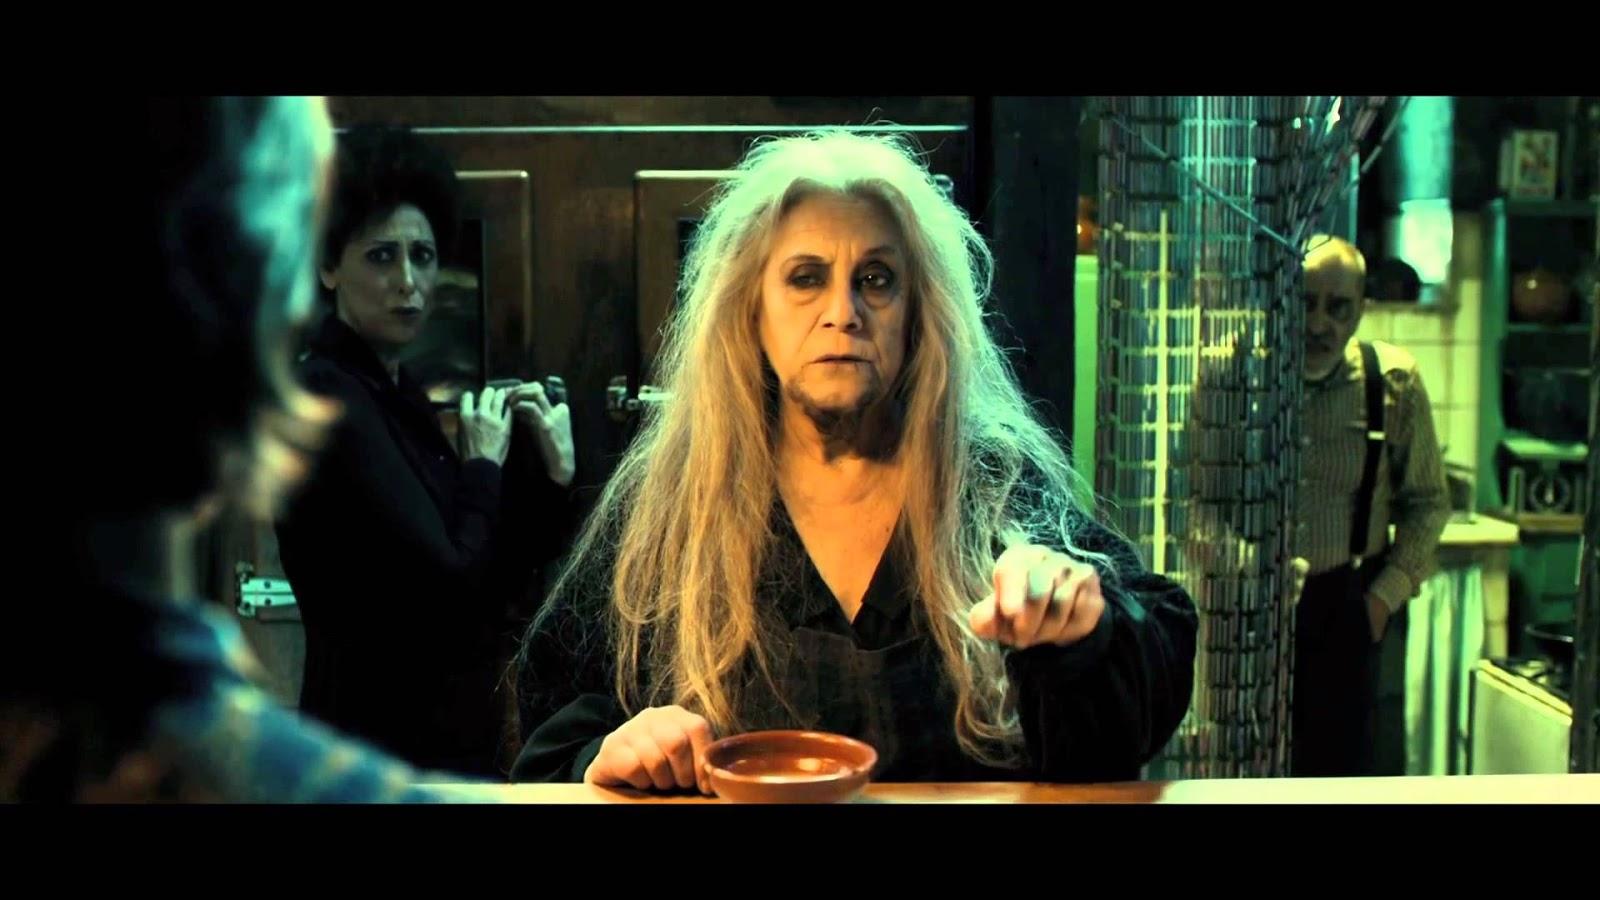 Le streghe son tornate al cinema dal 30 aprile 2015